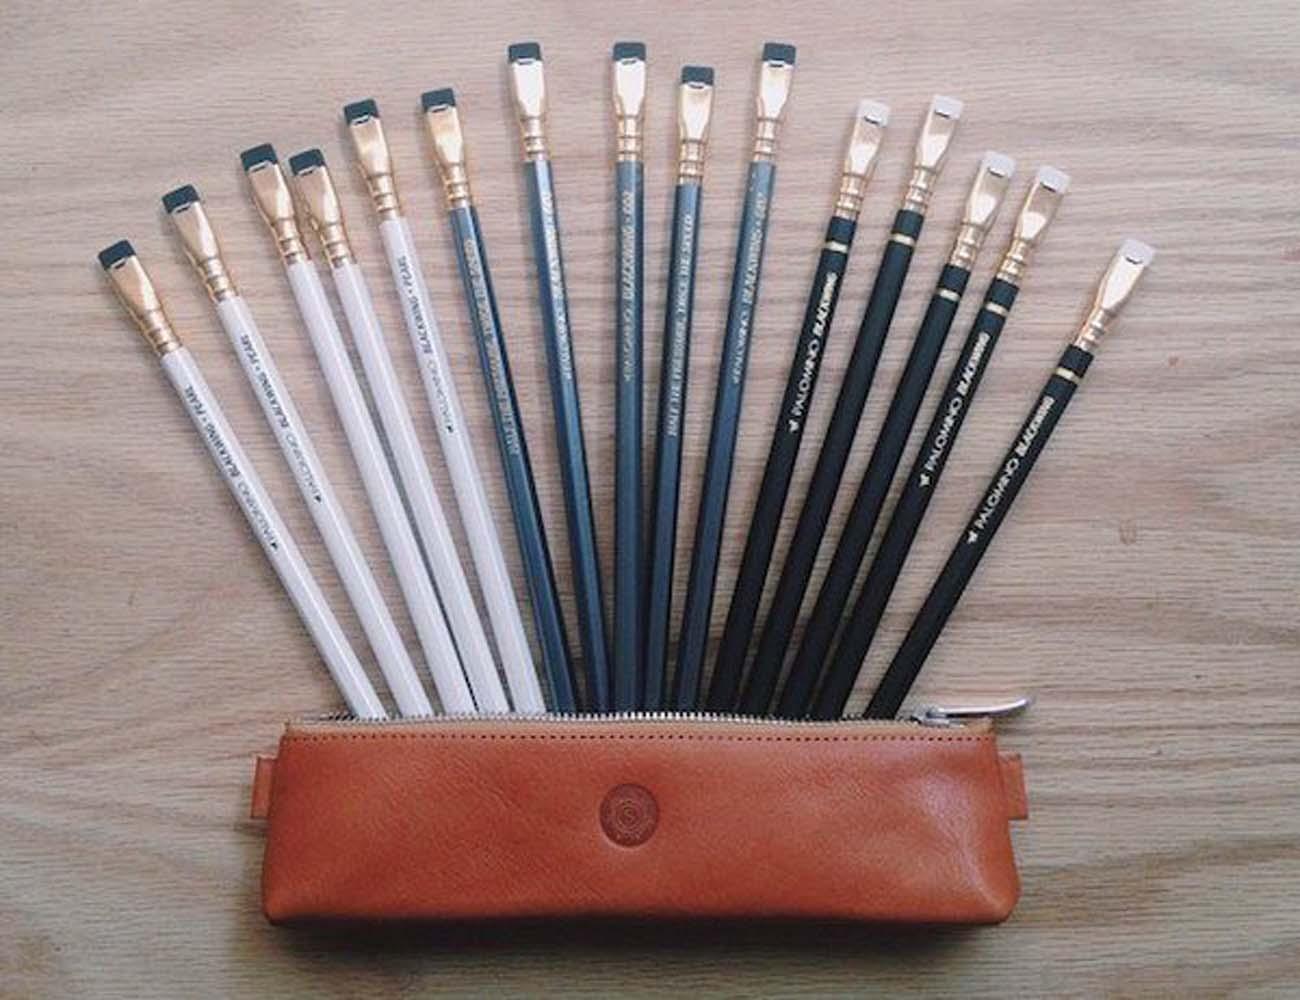 Sonnenleder – Simmel Pencil Case